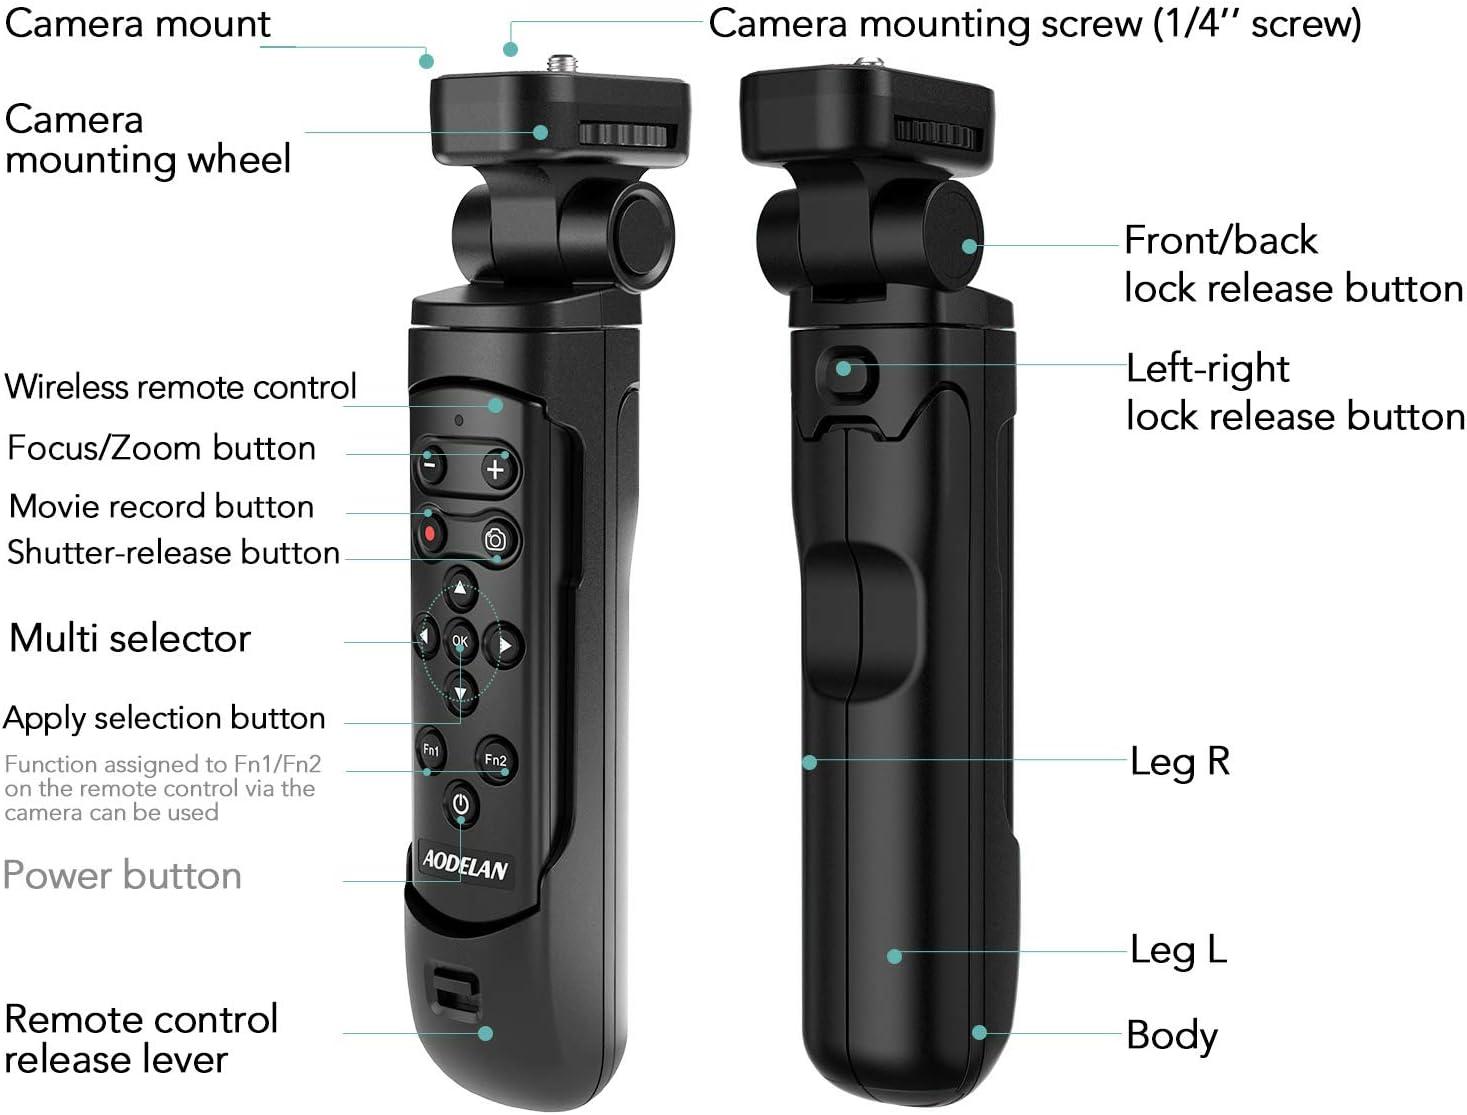 Handle Shooting Grip Tripod with BR-E1B Shutter for Canon EOS R RP R5 R6 90D M50 SL2 PowerShot SX70 HS Cameras AODELAN Mini Camera Tripod Replaces Canon HG-100TBR